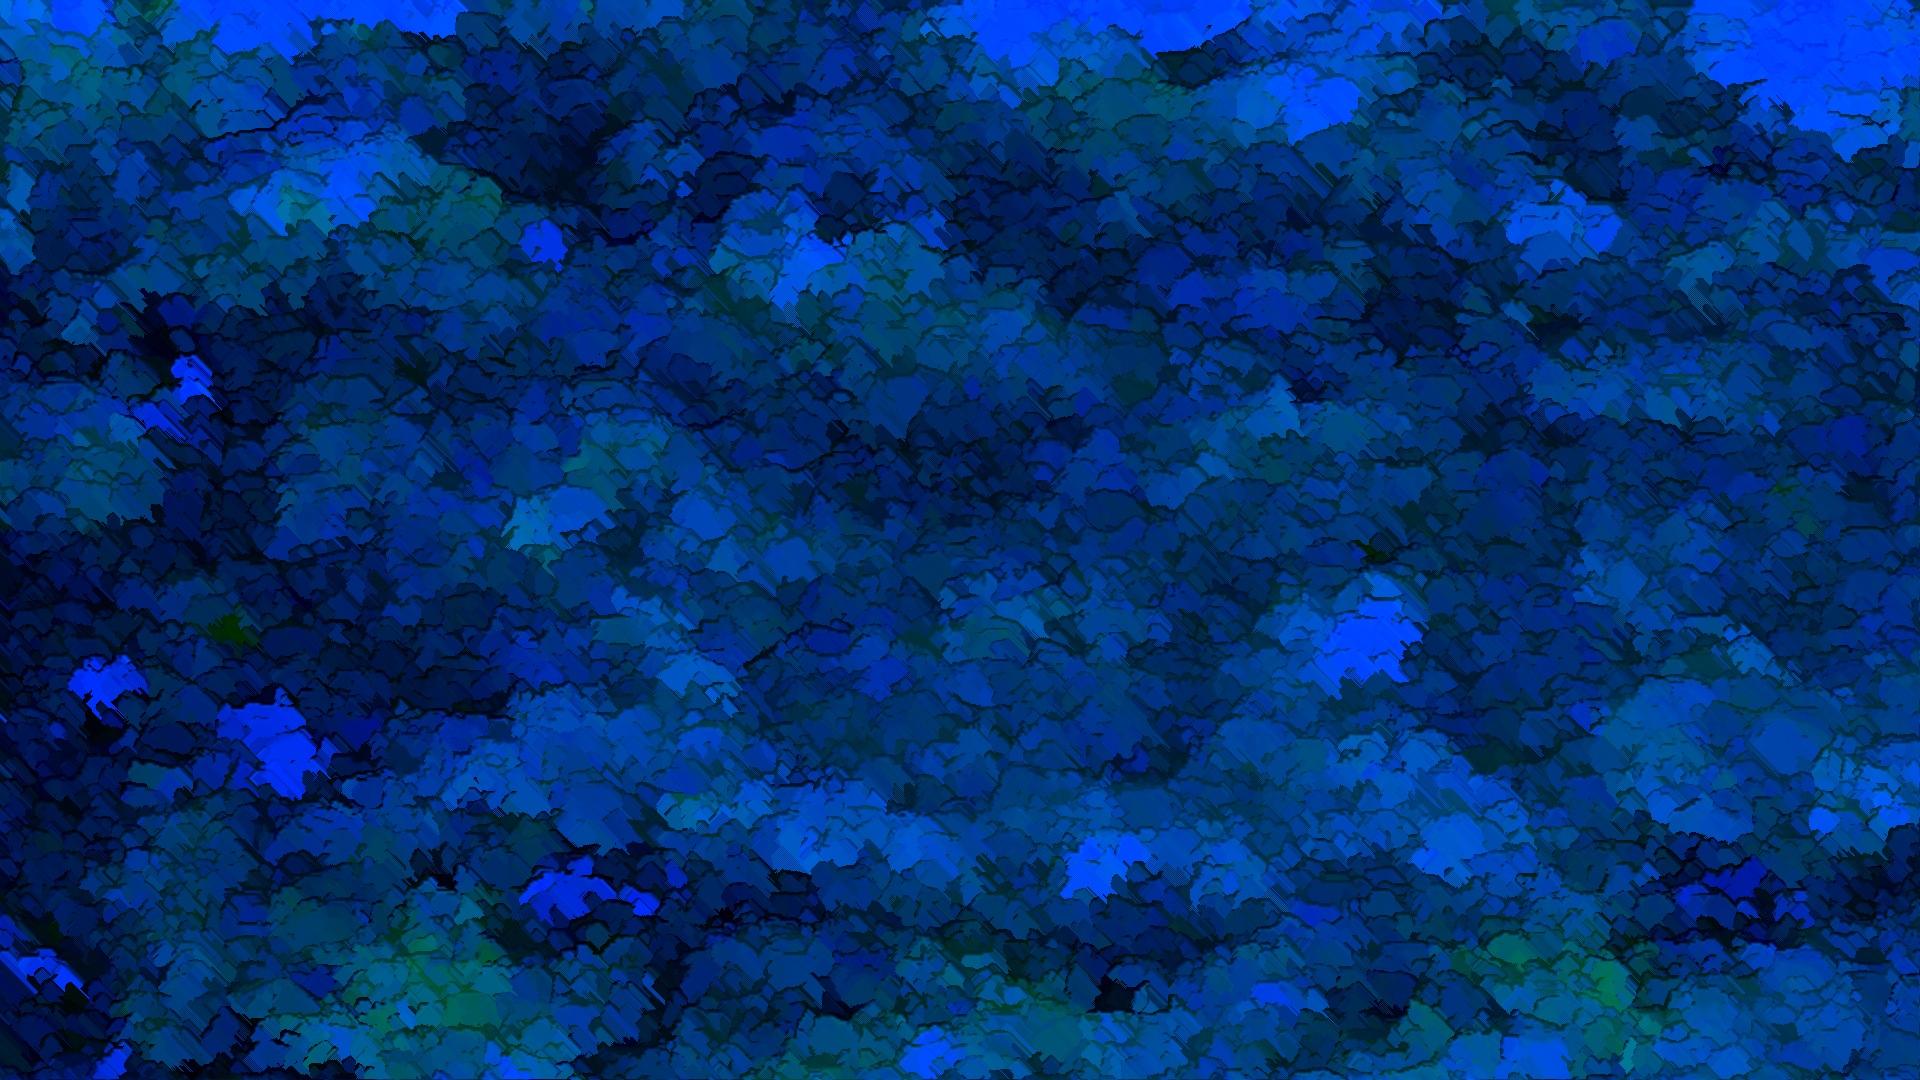 Black And Cream Damask Wallpaper Textured Background Wallpaper 1920x1080 5897